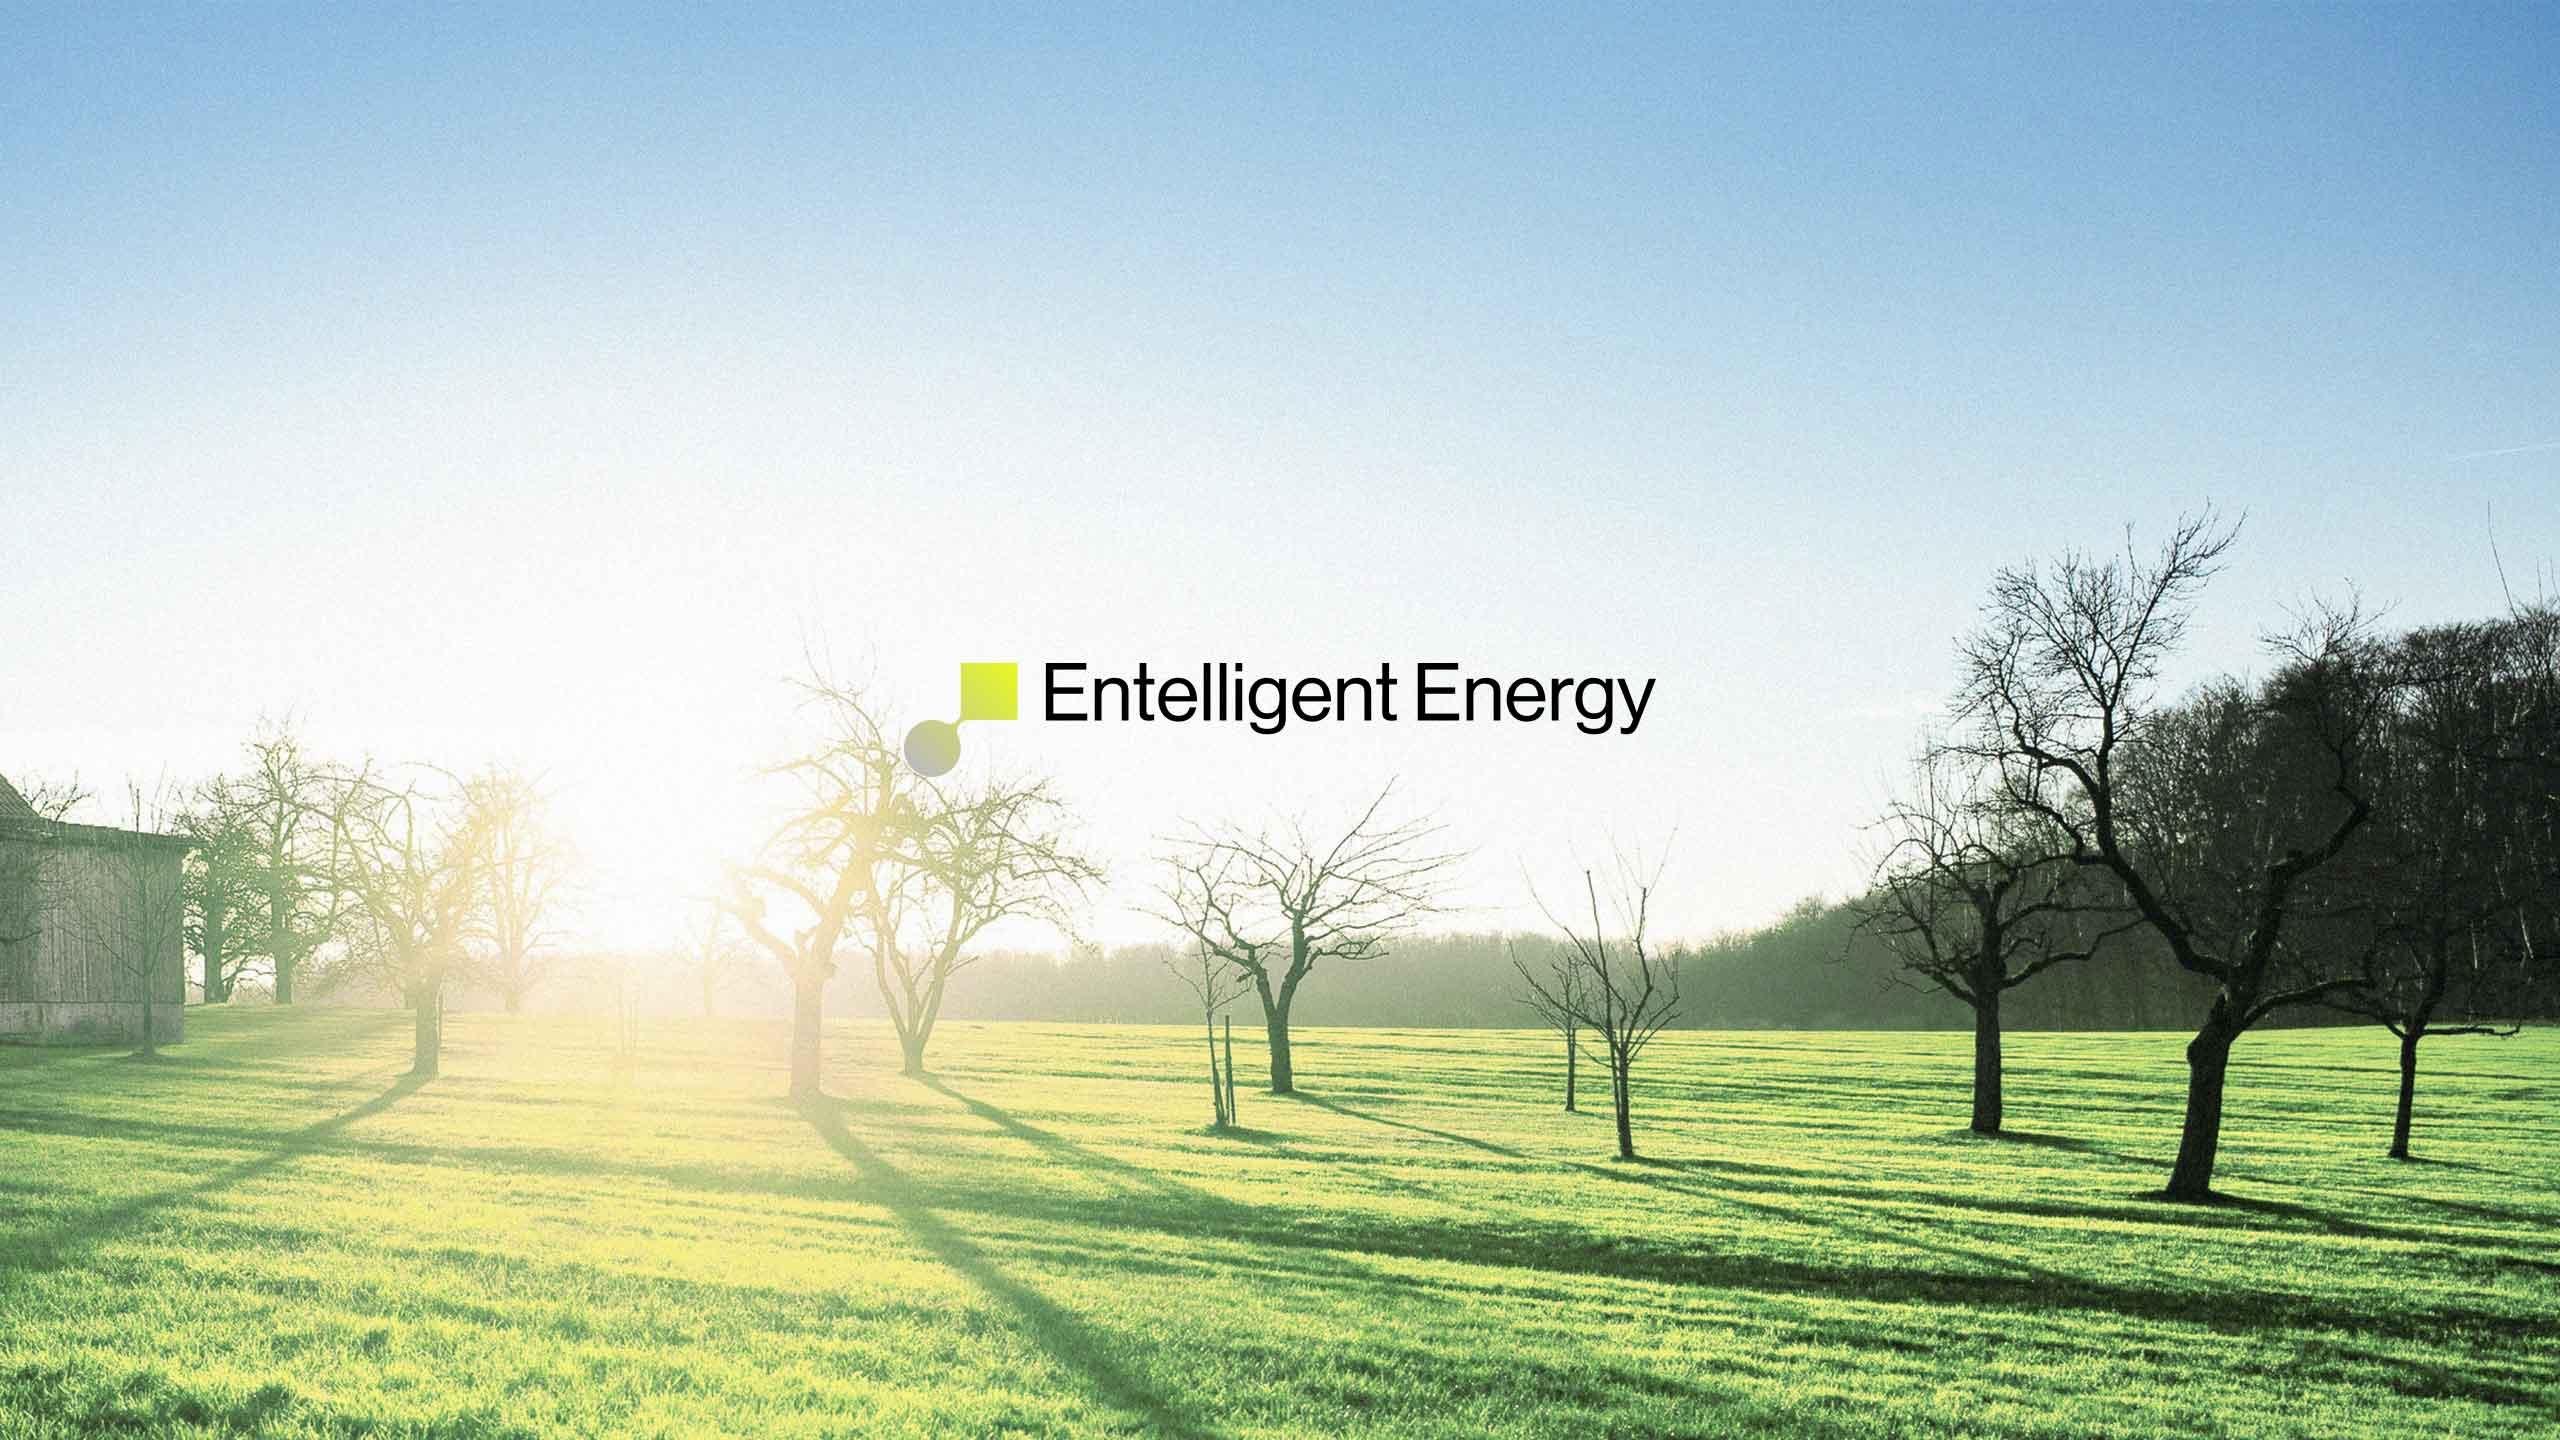 Entelligent-Energy-07e